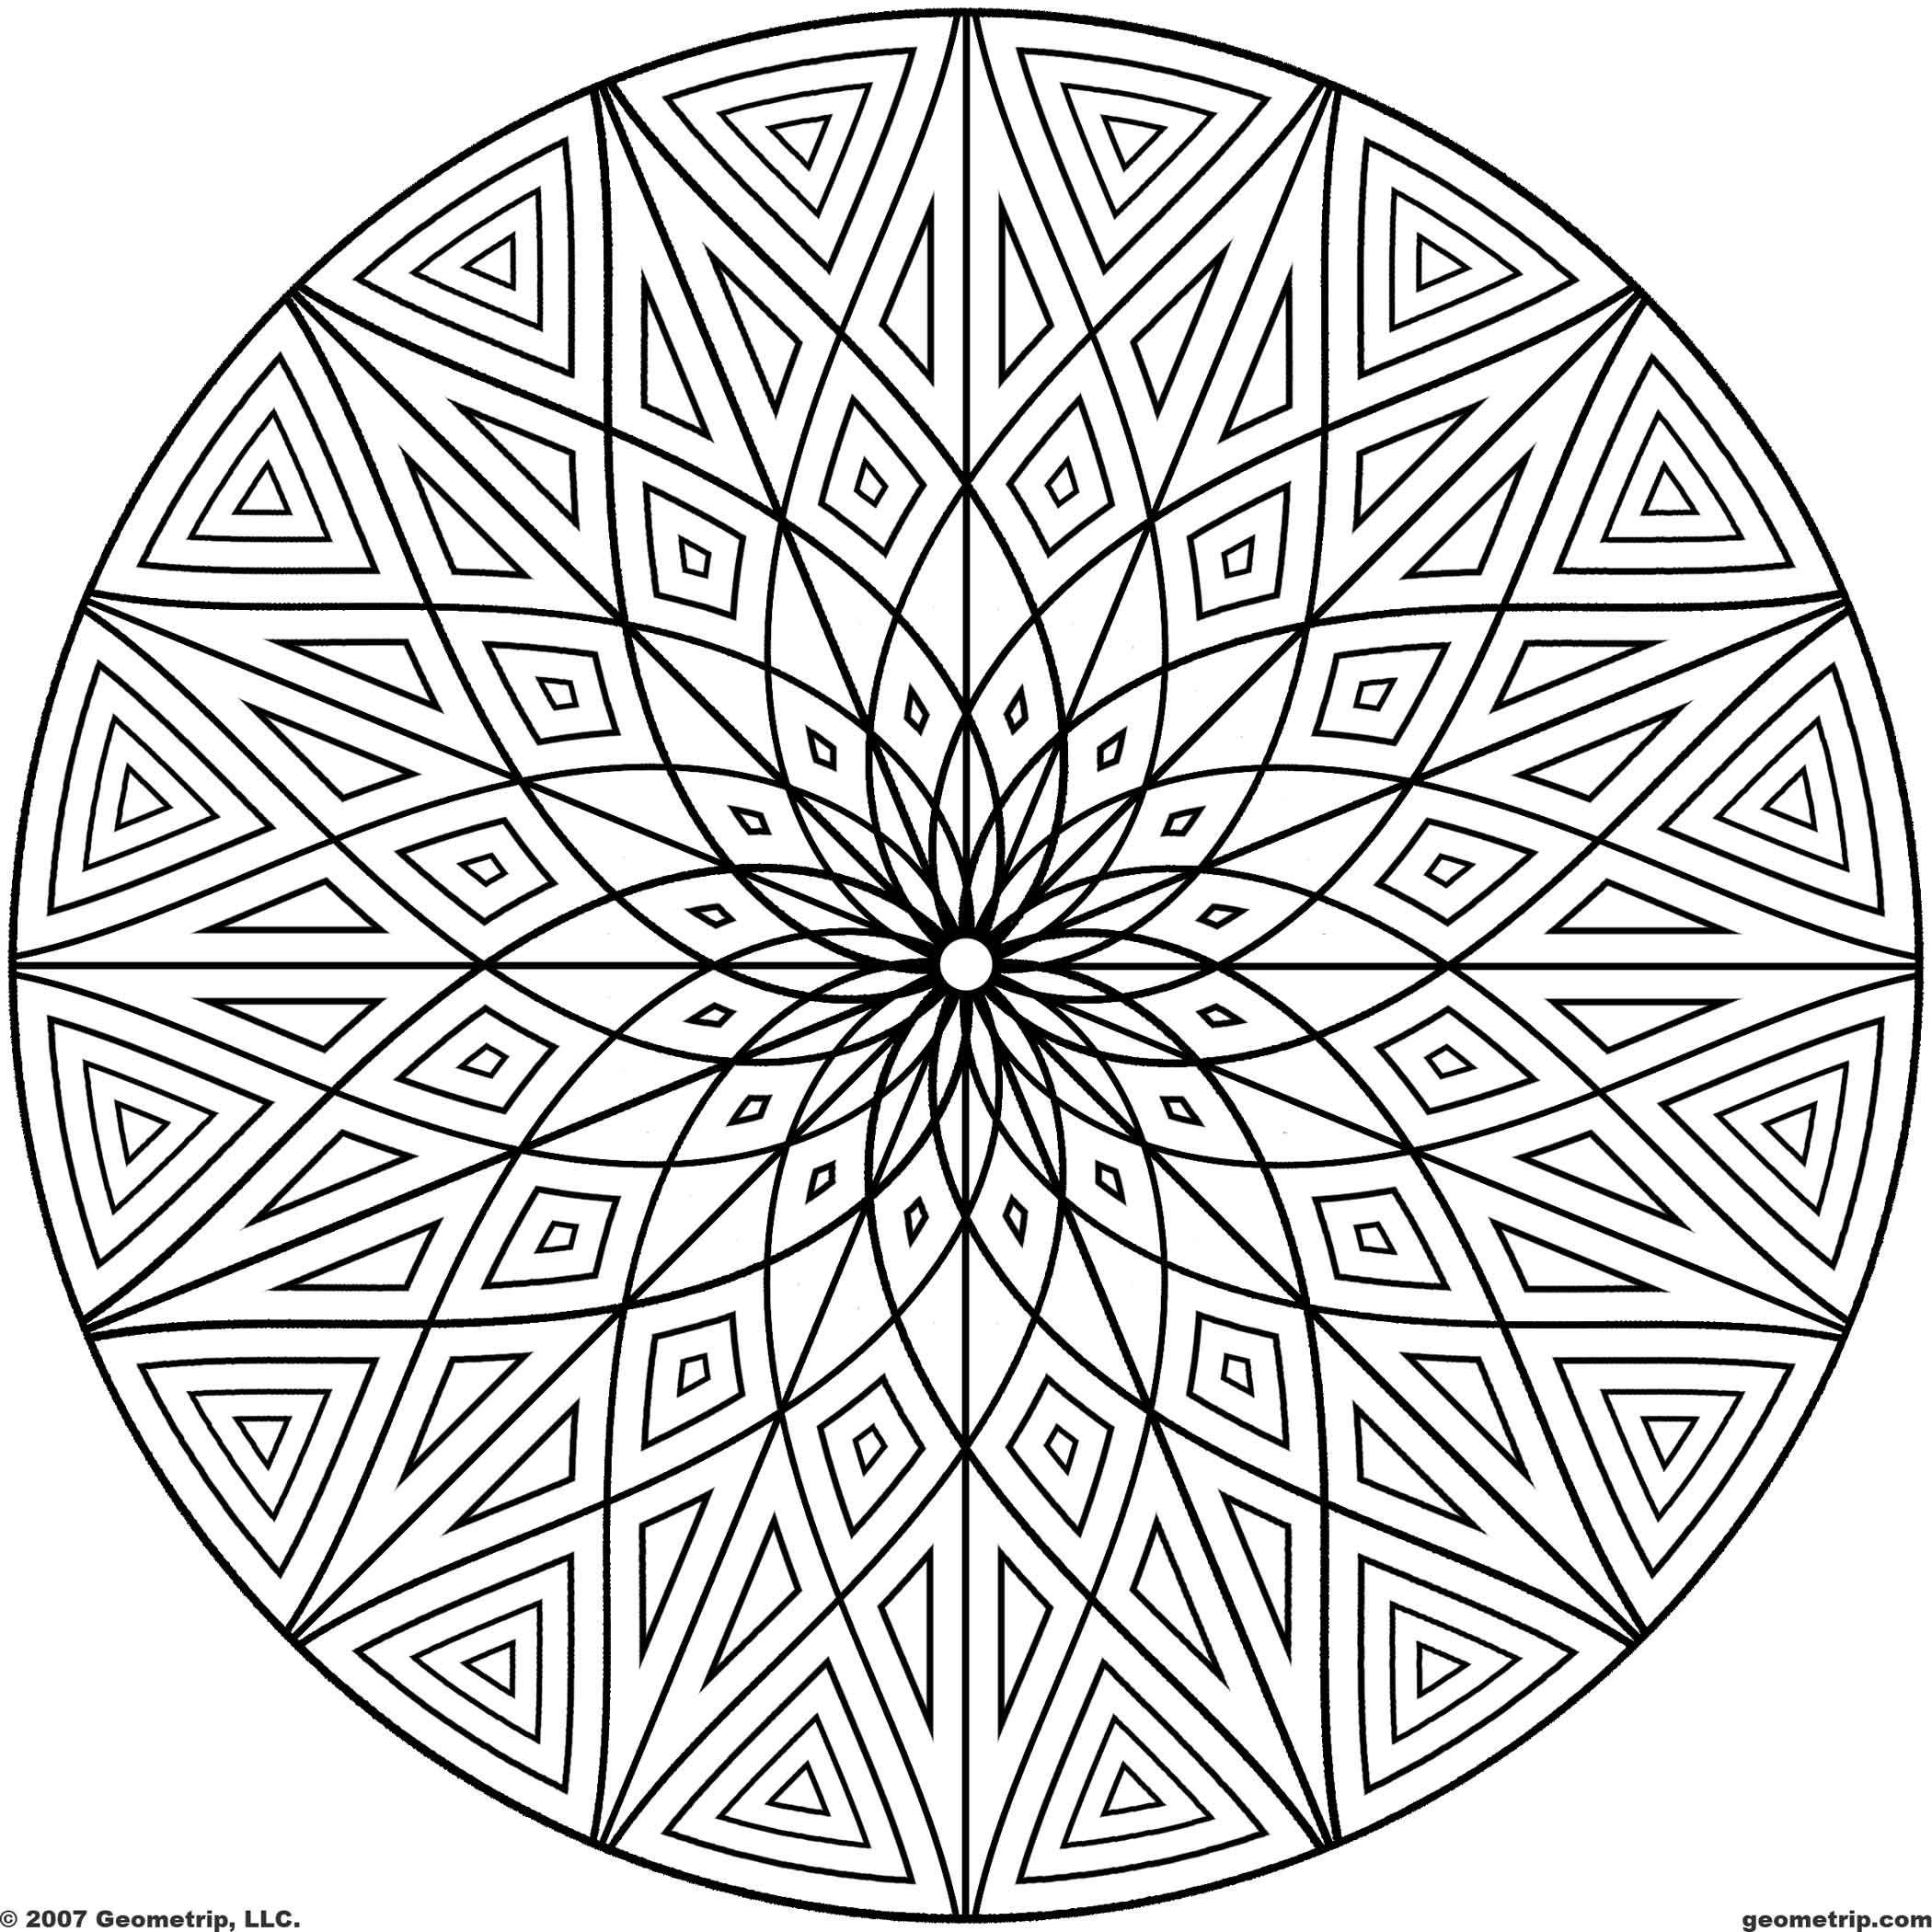 Printable Geometric Patterns Geometrip